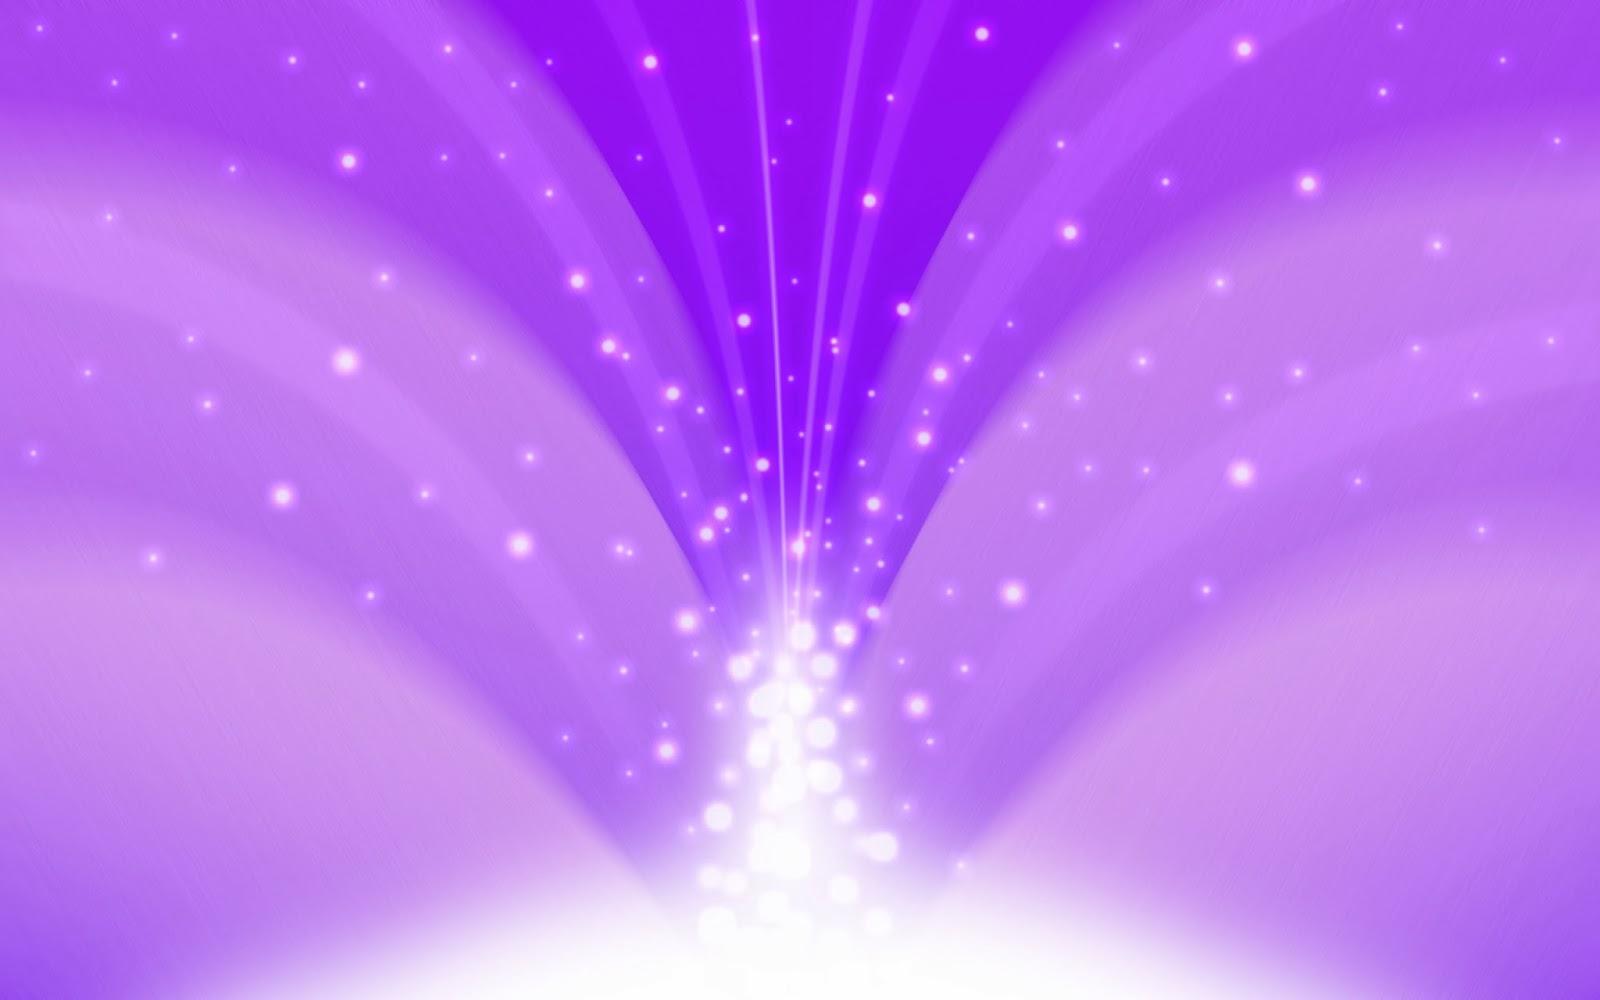 Light Blue Violet Color Abstract Wallpaper Desktop Hd: خلفيات ملونة للتصميم بدقة عالية